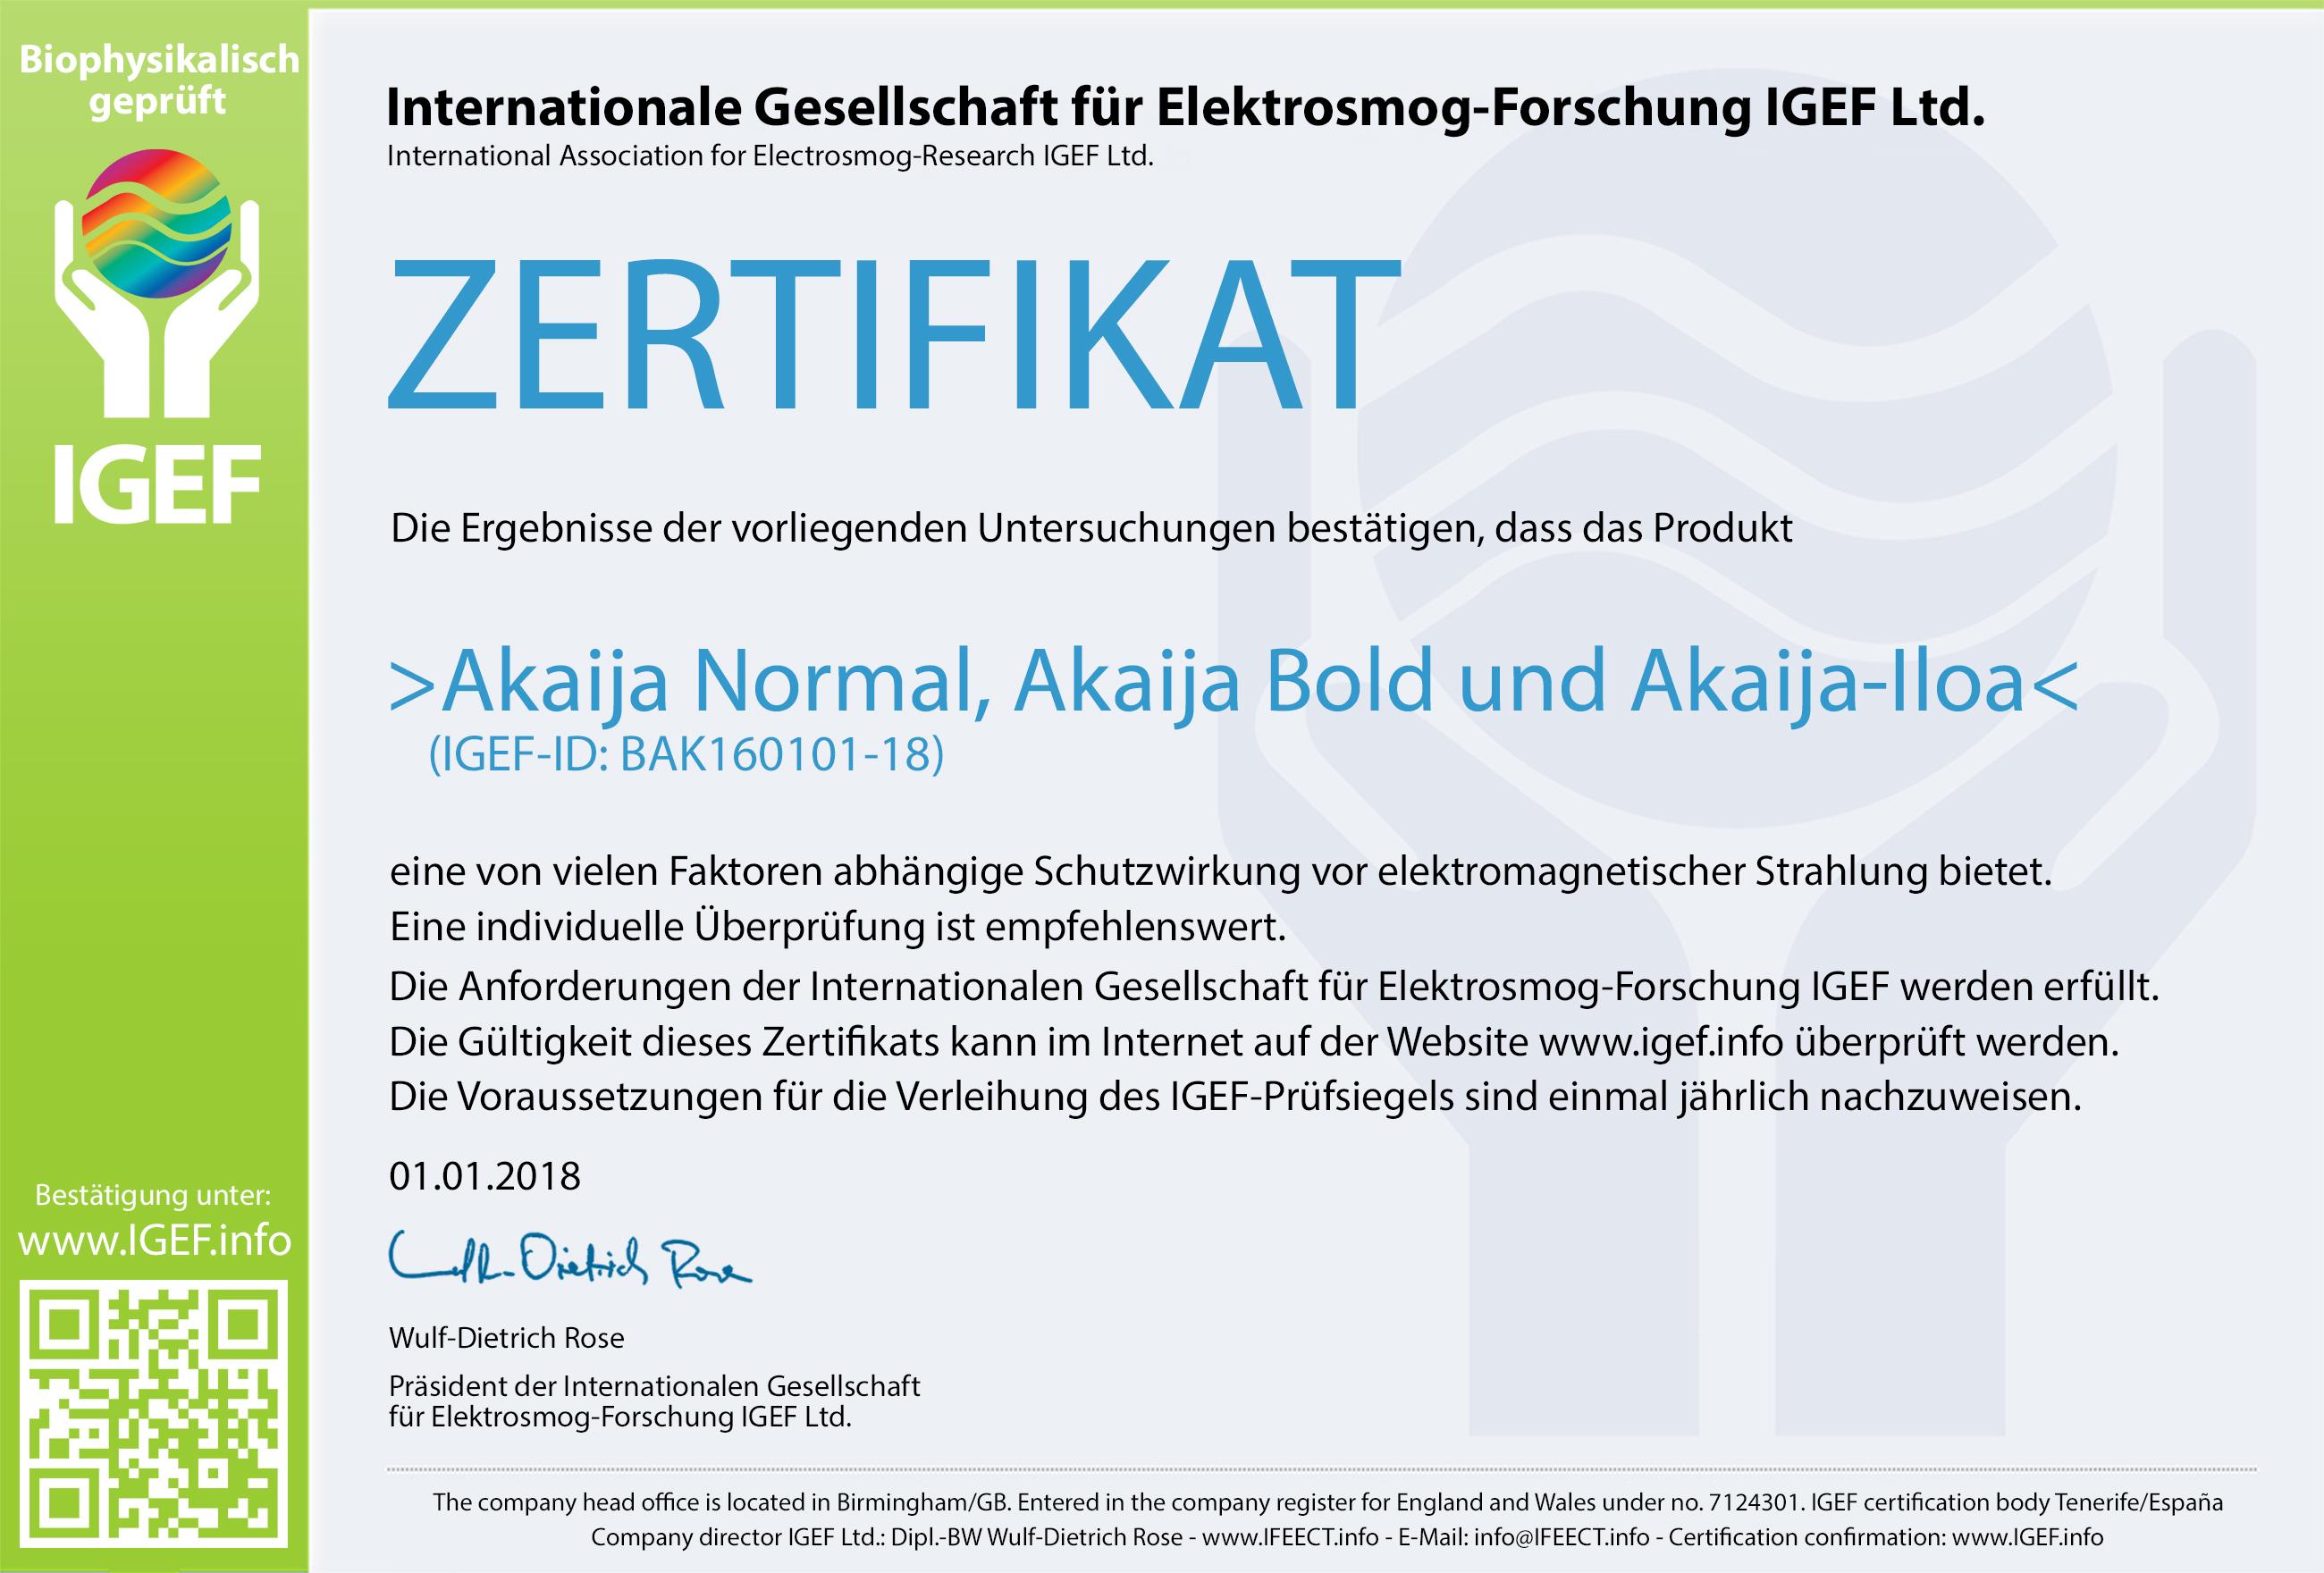 IGEF-Zertifikat-BAK-DE-18